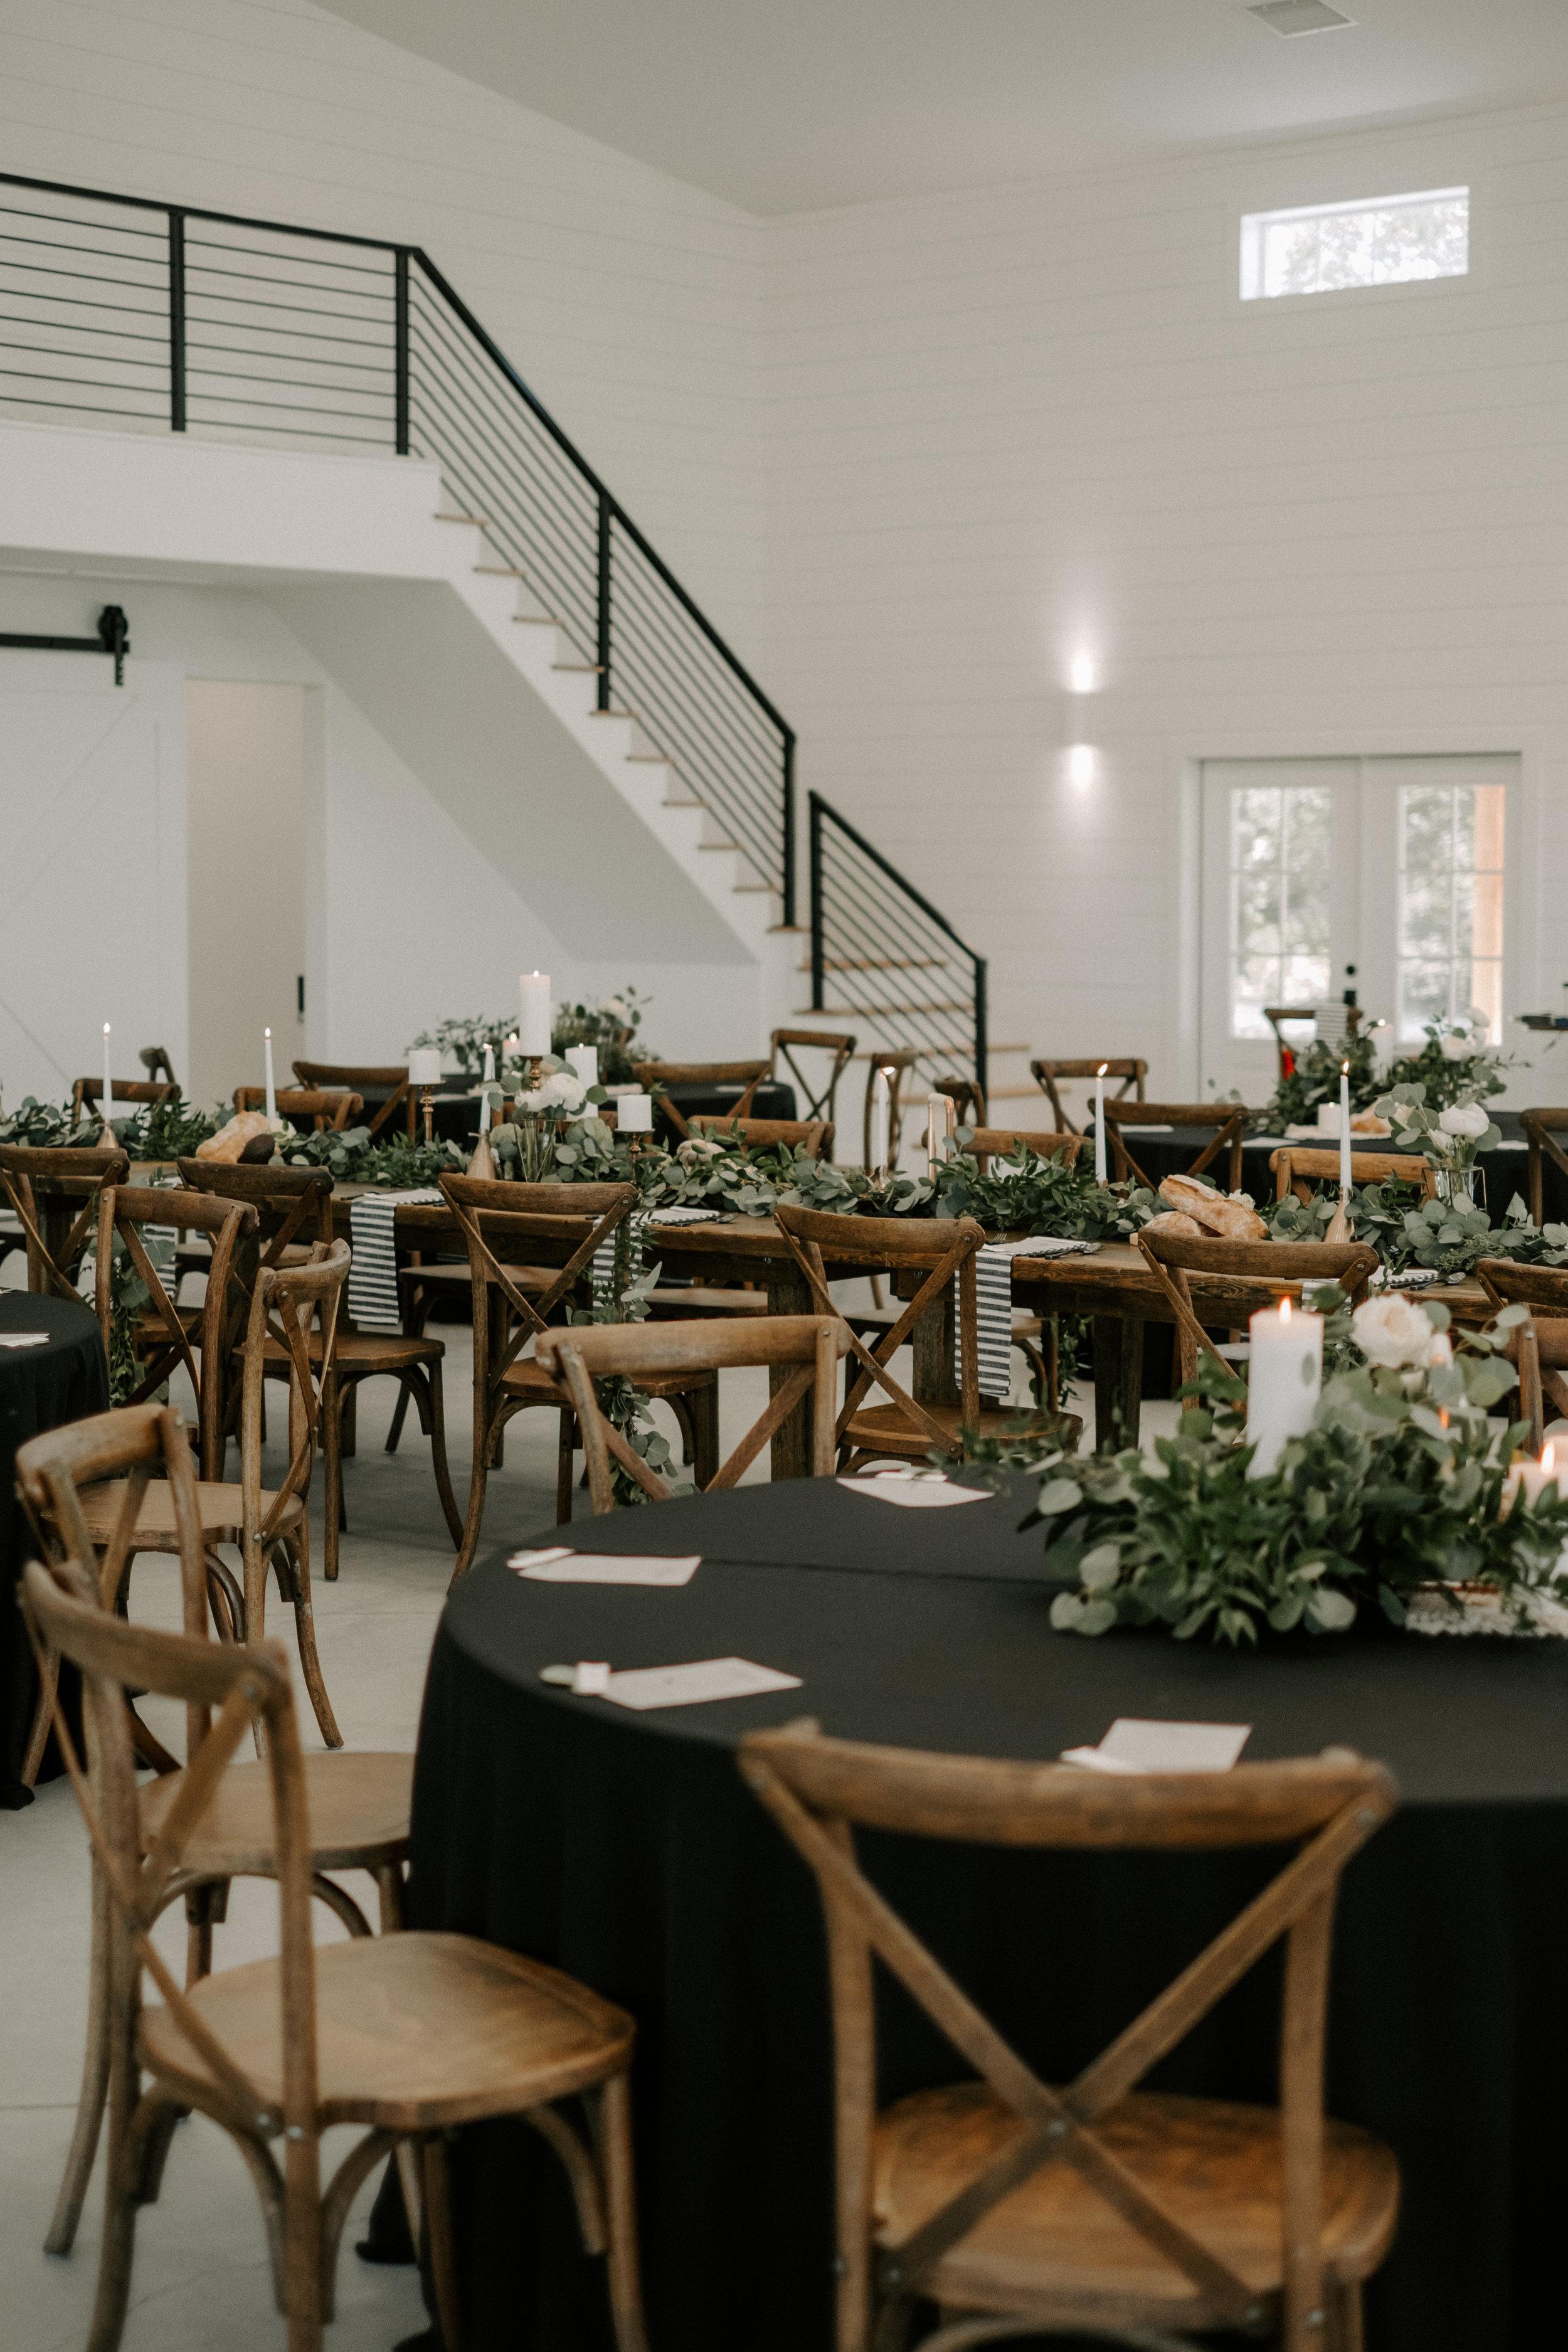 The-Barn-at-Grace-Hill-Wichita-Wedding-Venue-313.jpg